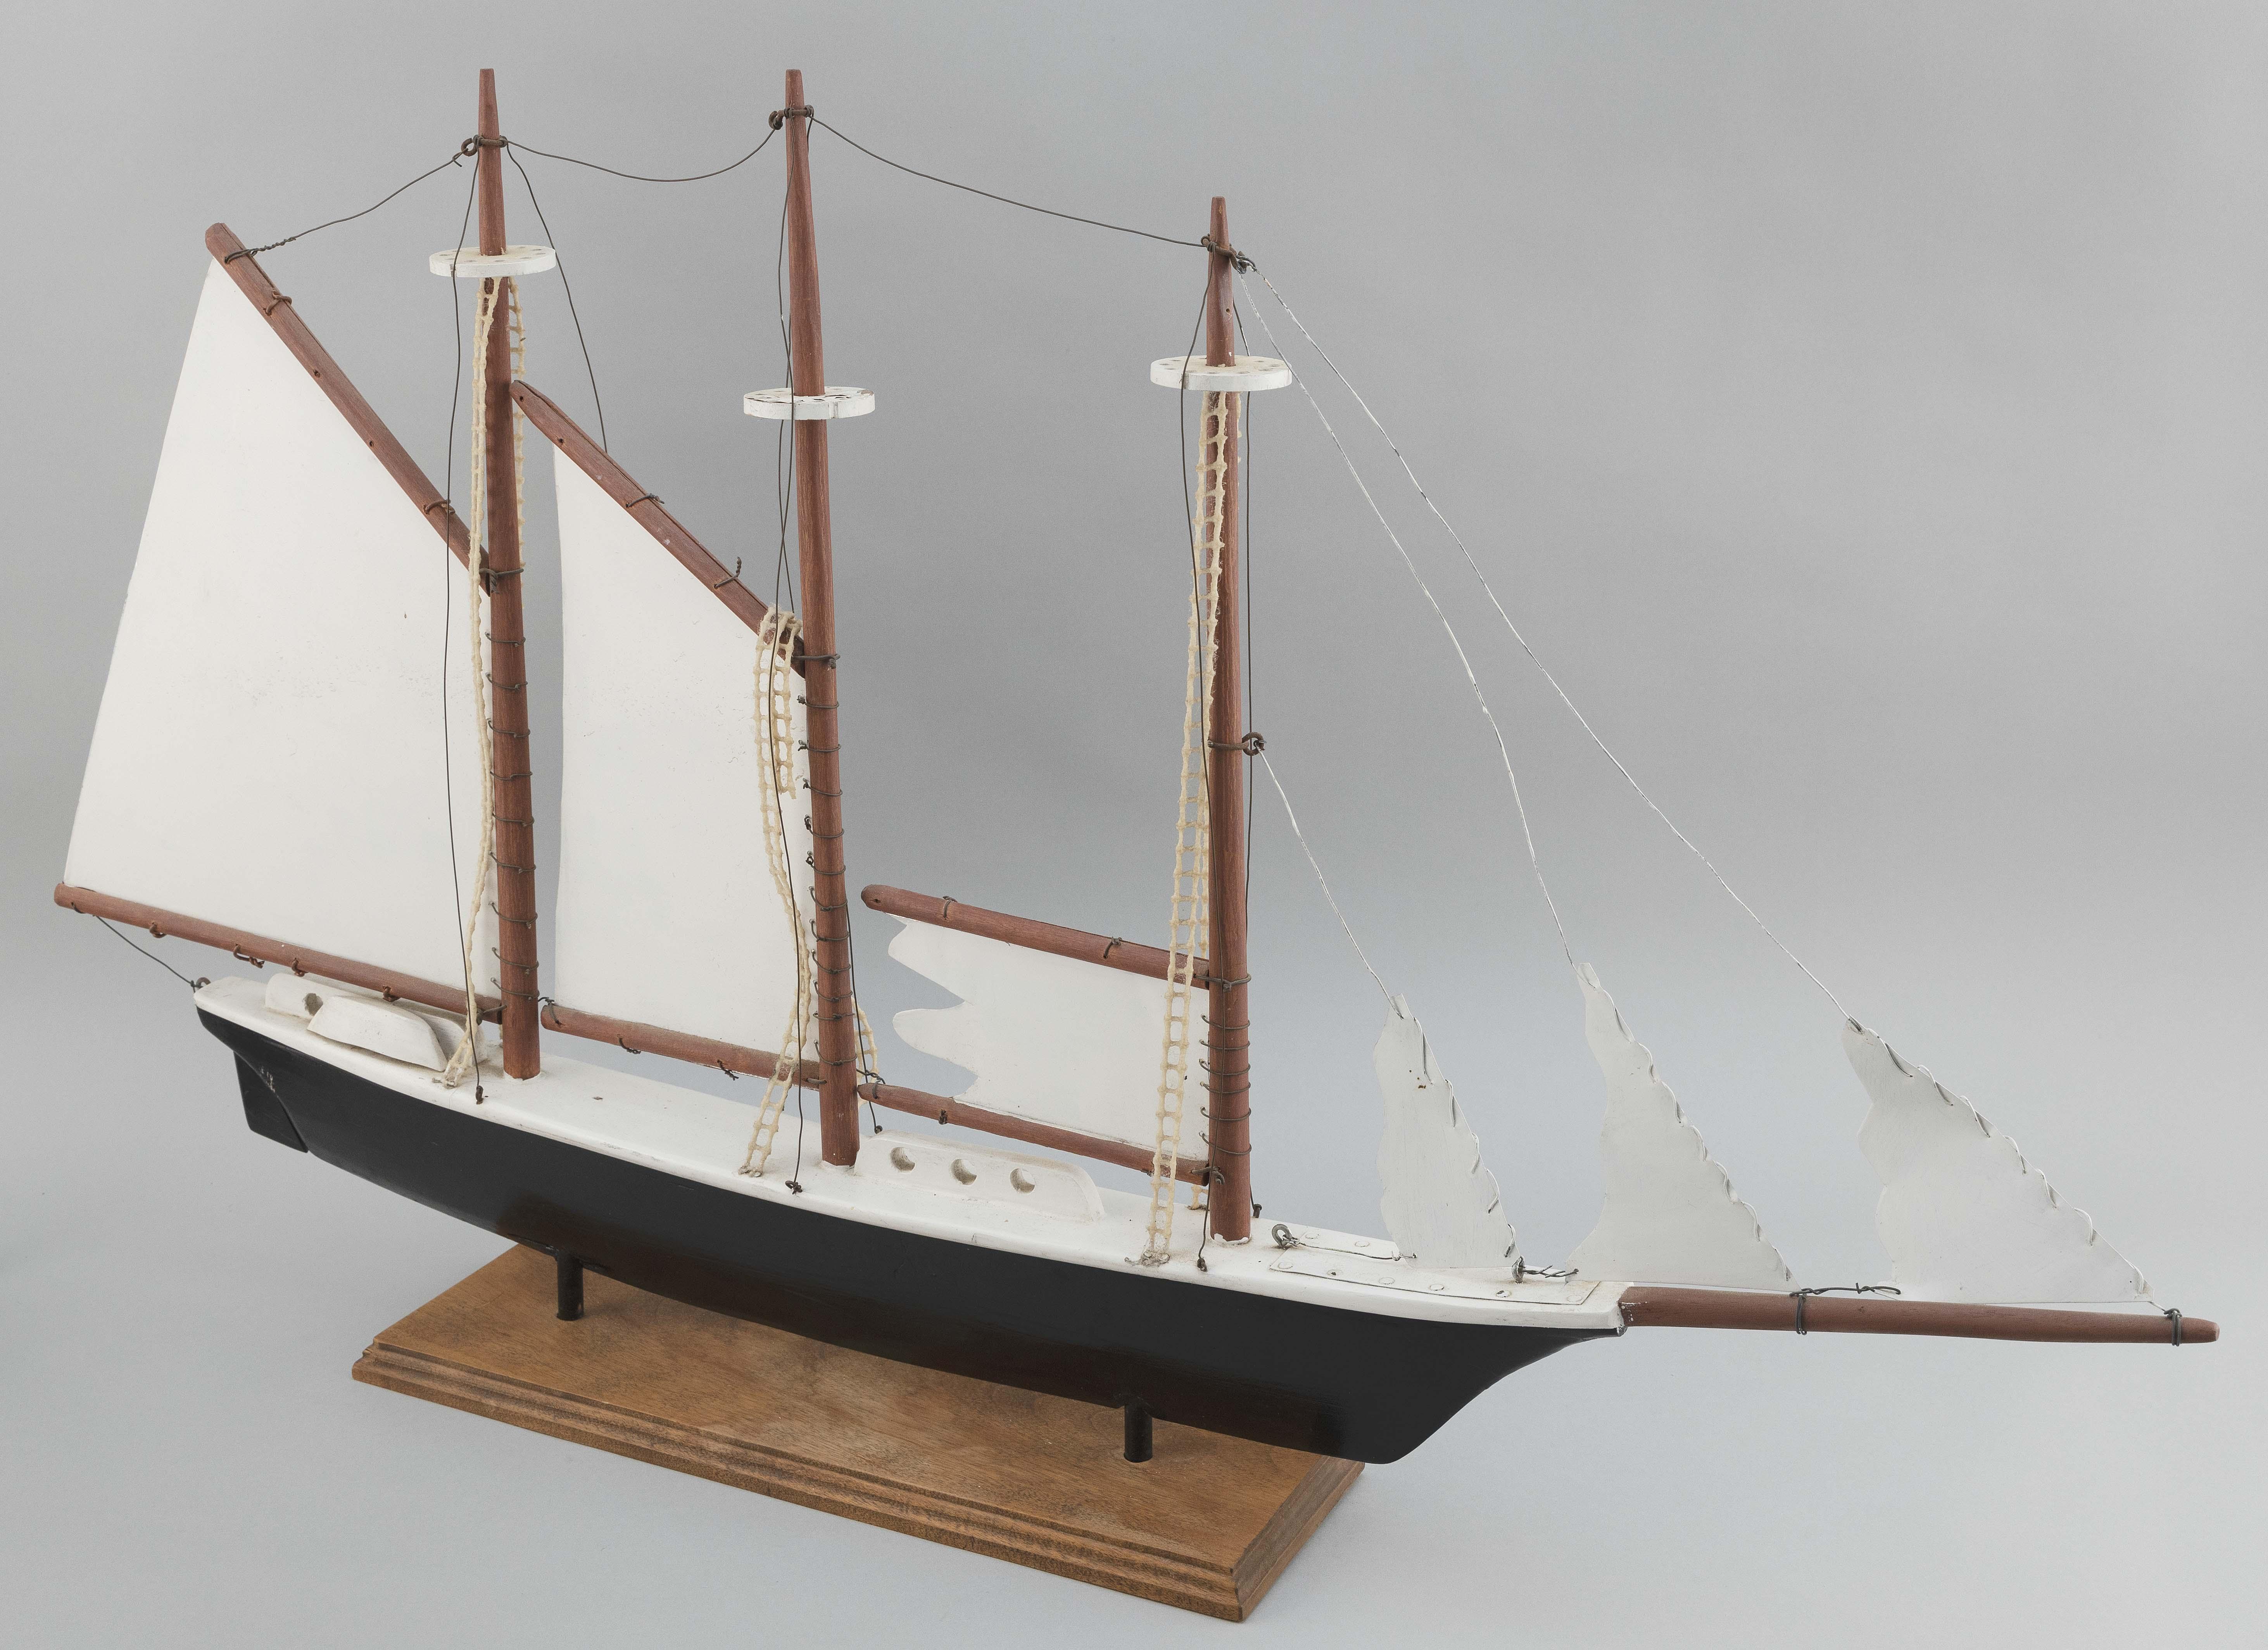 "THREE-MASTED SHIP WEATHER VANE 20th century Length 37""."